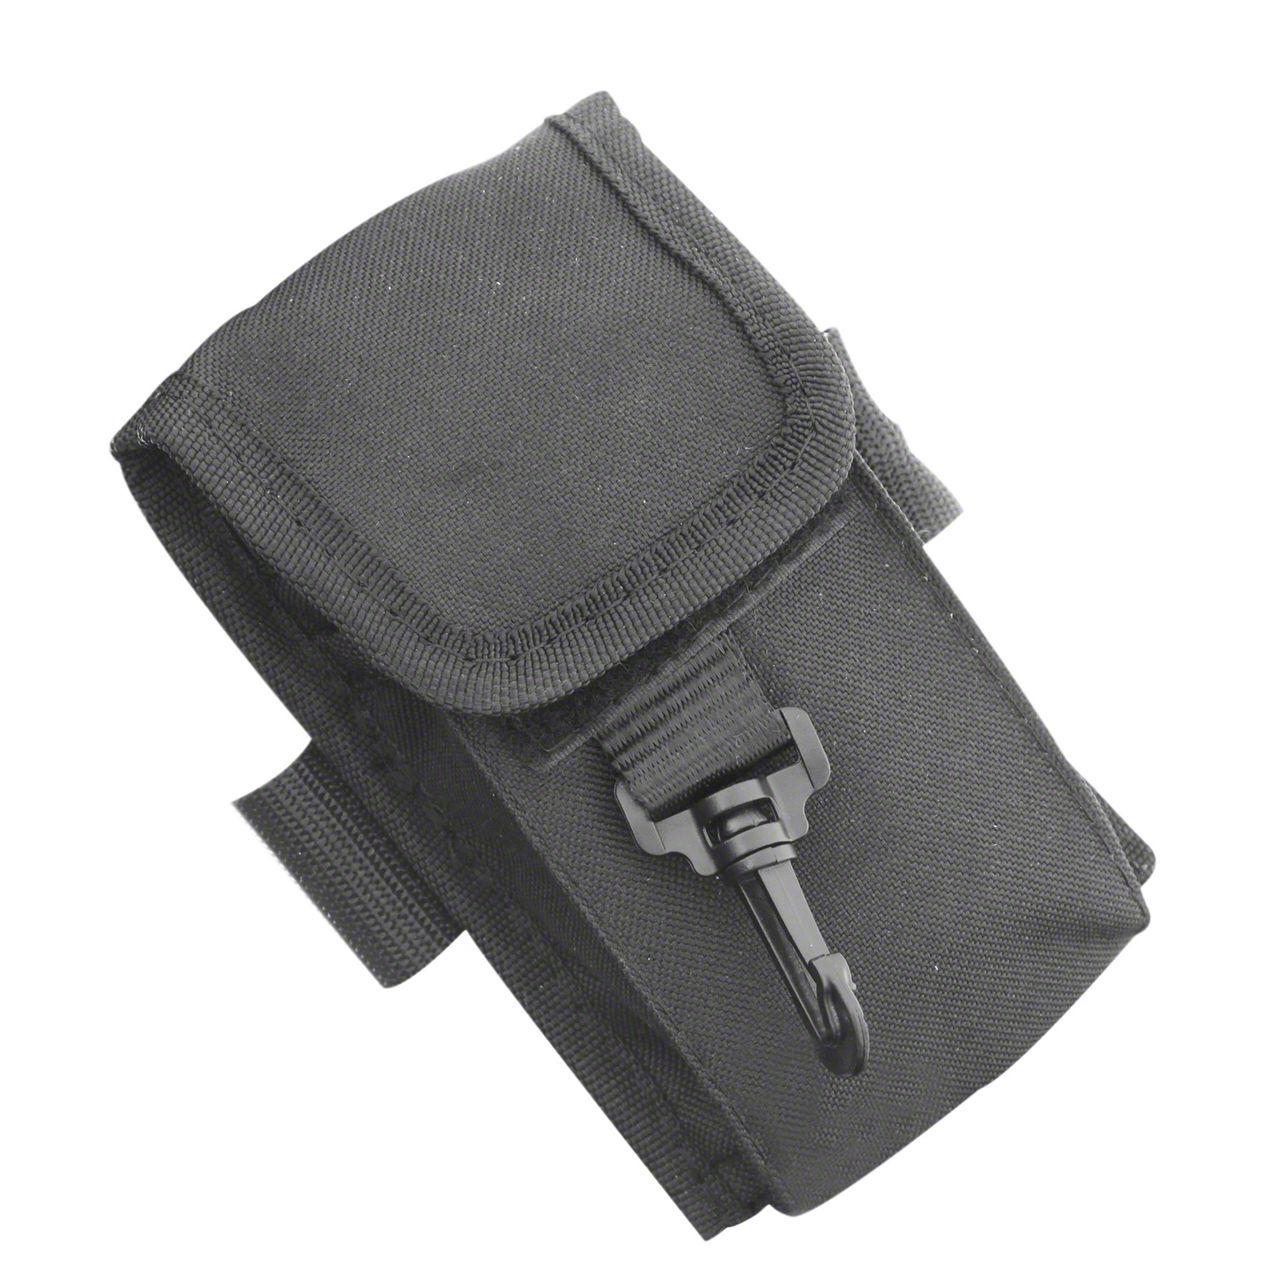 Smittybilt Personal Device Holder